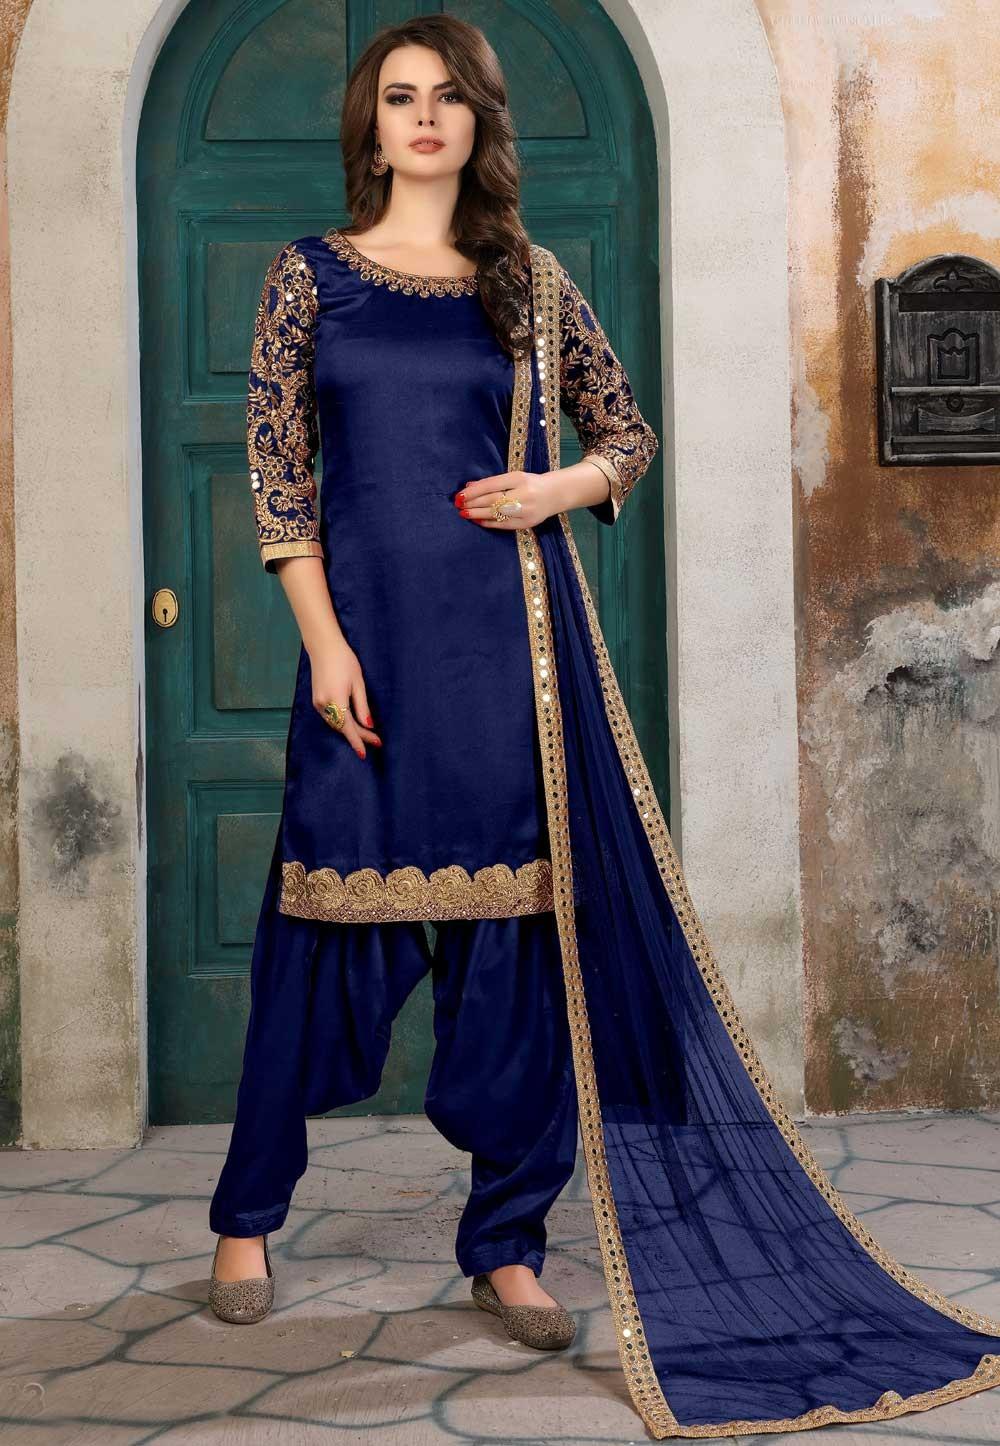 Nice Looking Navy Blue Color Party Wear Salwar Kameez